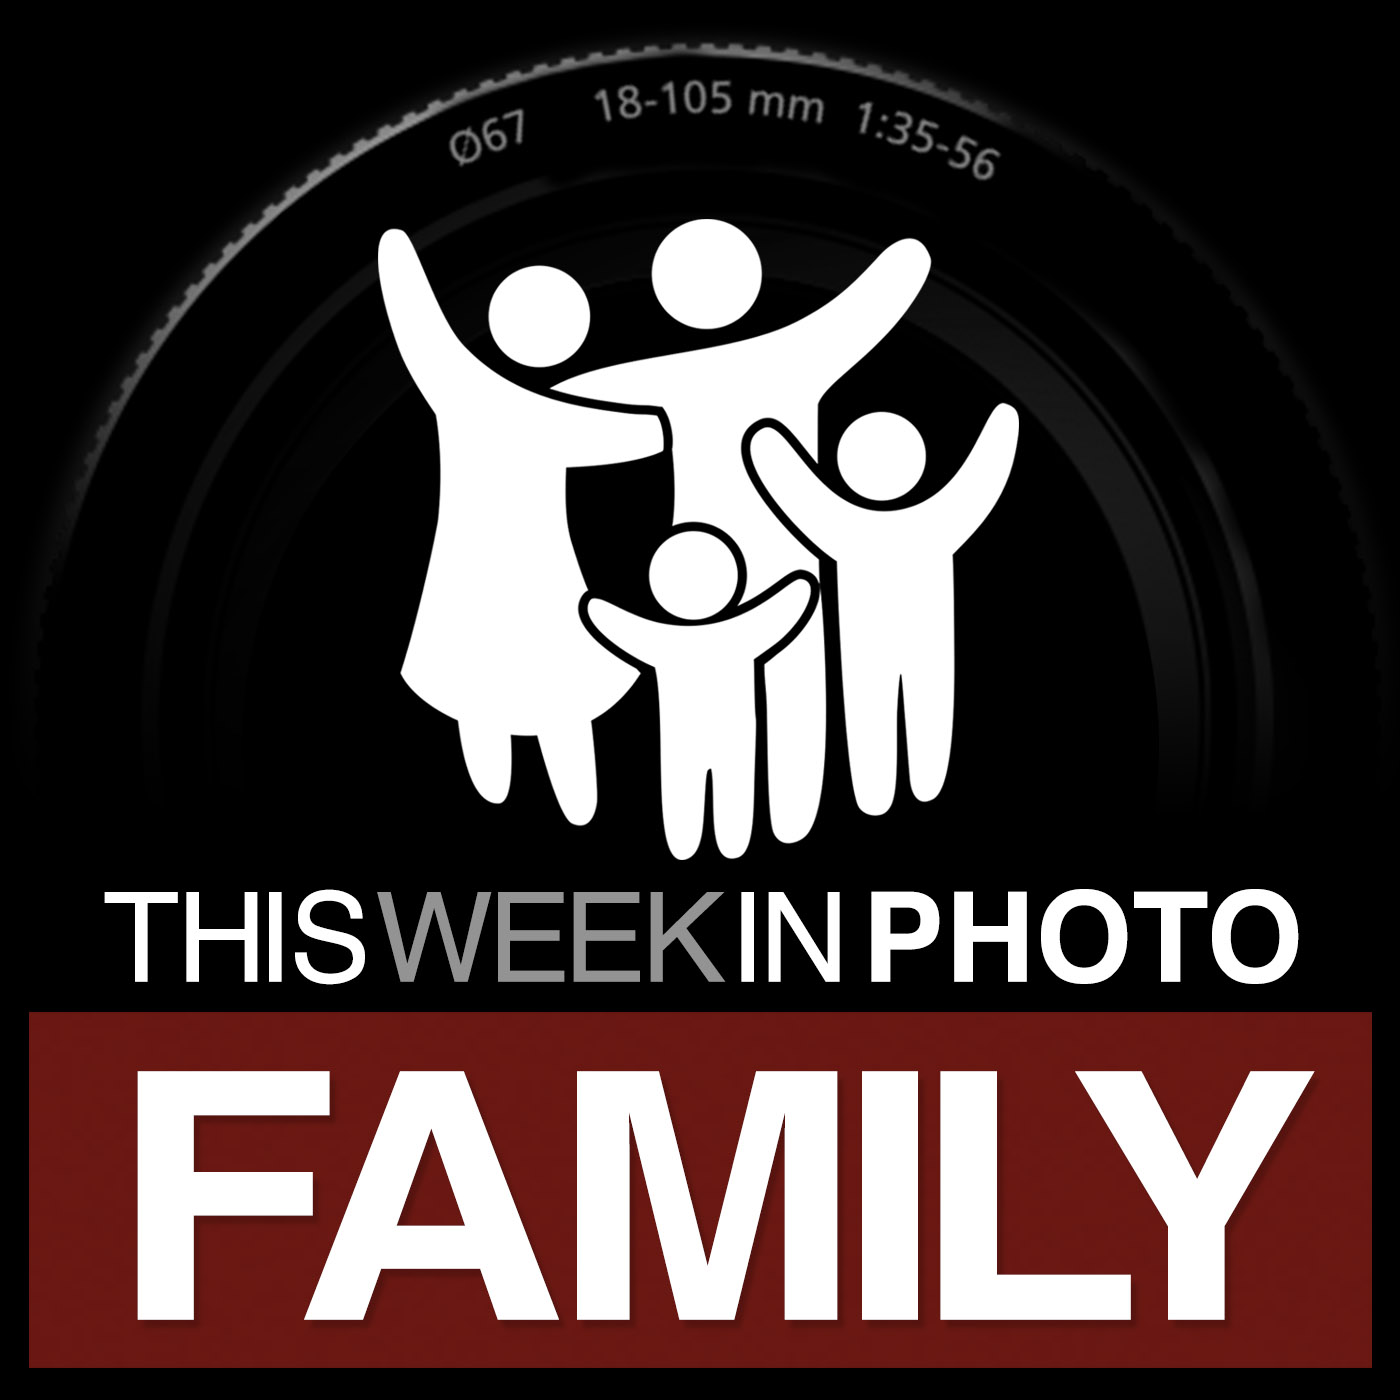 TWiP Family